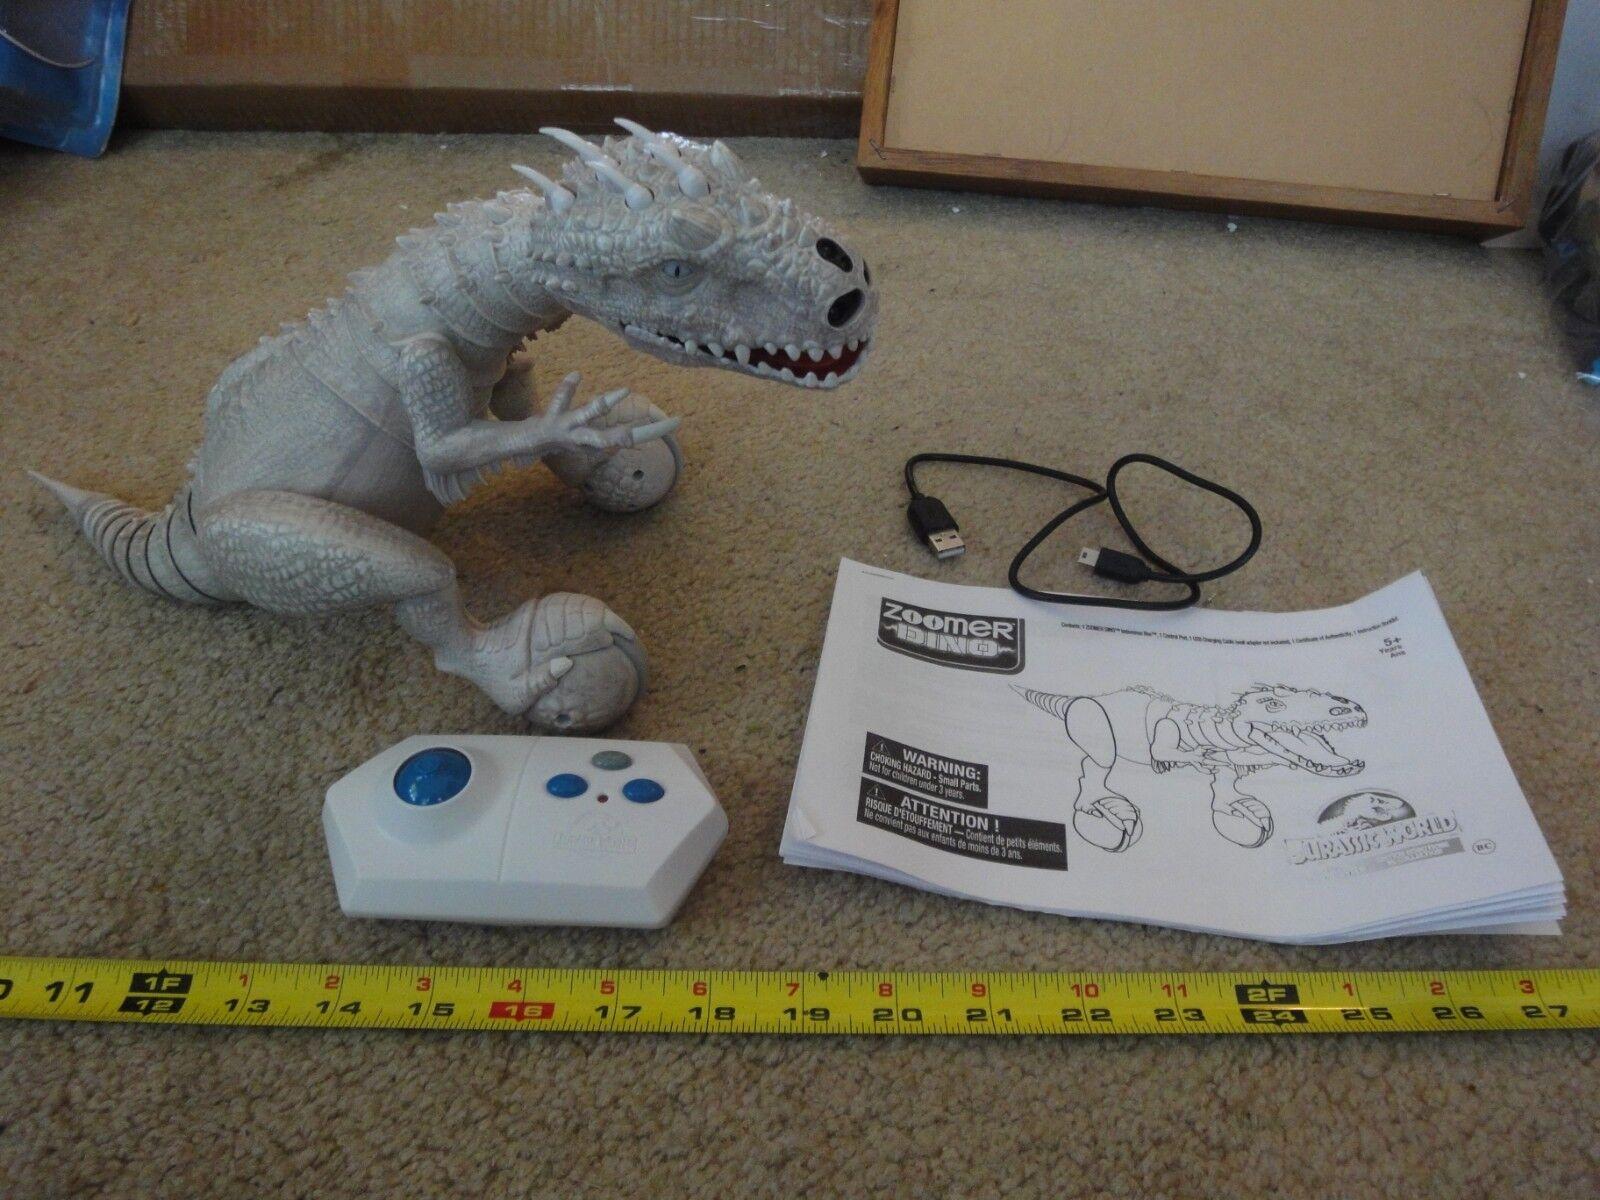 Jurassic park, welt, indominus rex funkgesteuerte dino zoomer, rc arbeitet